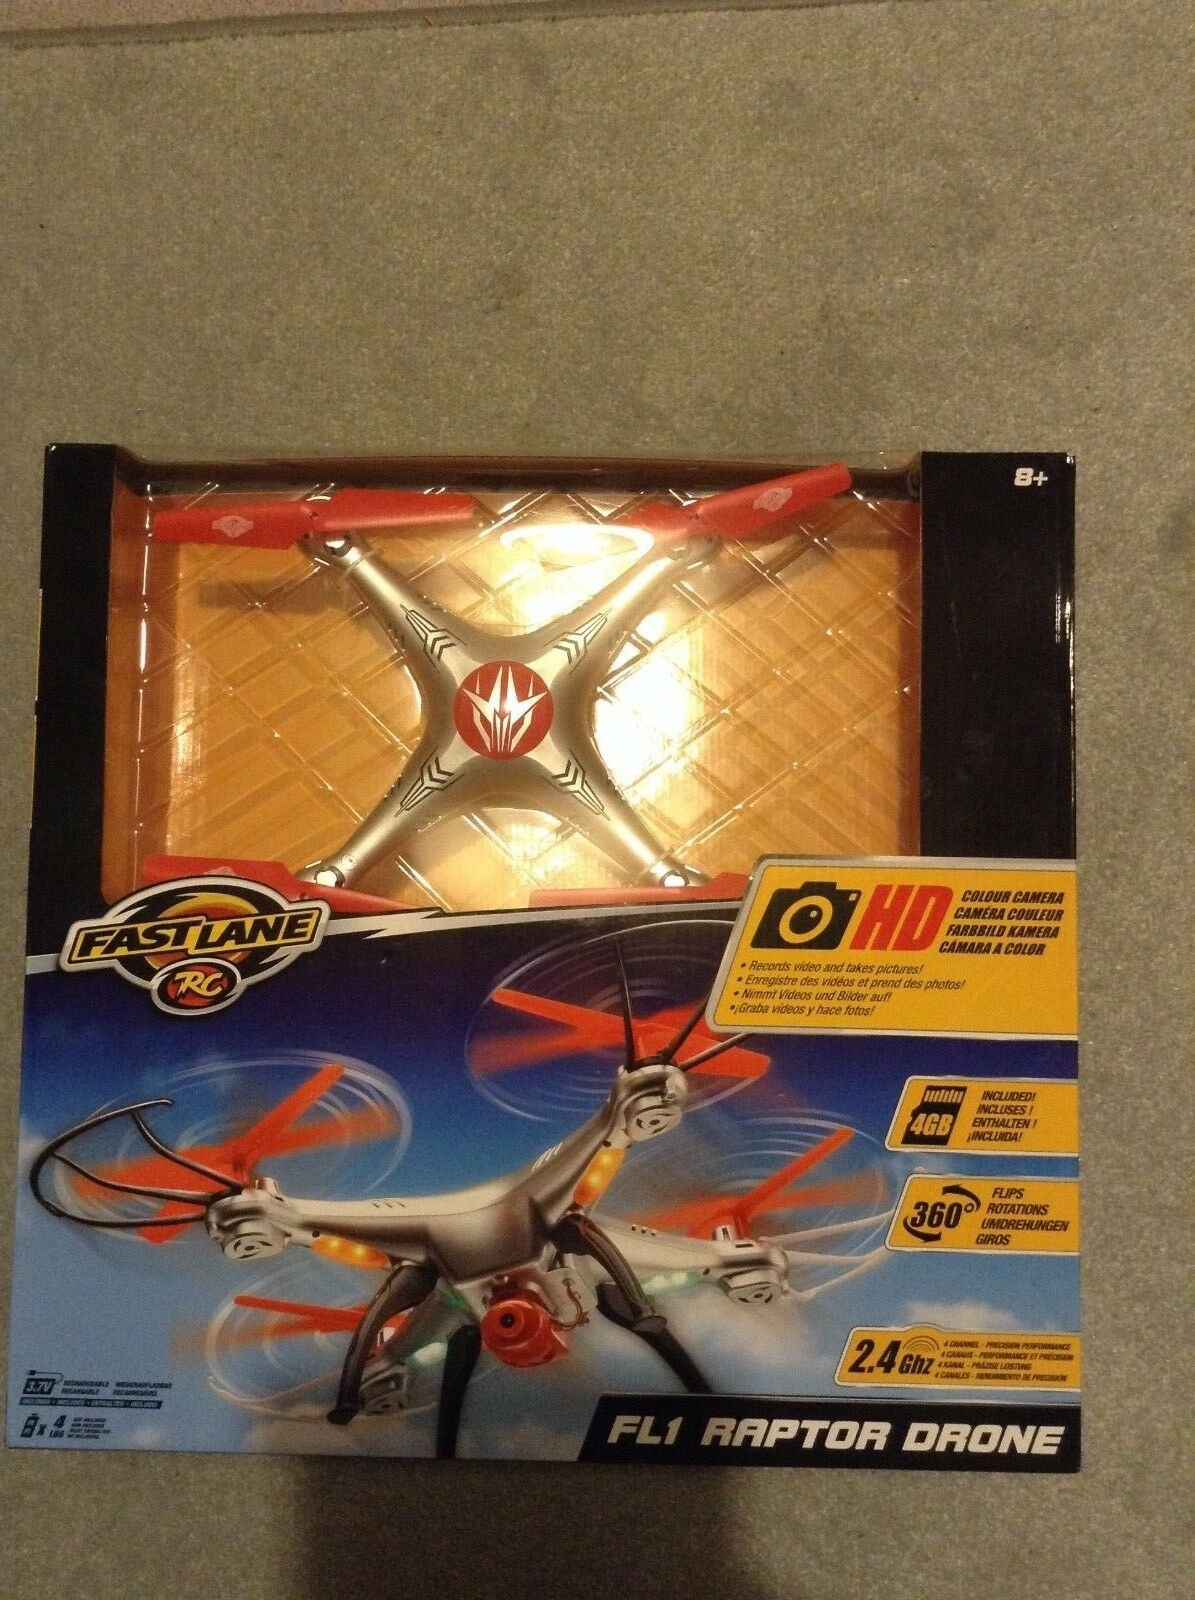 Fast Lane FL1 Raptor RC Drone  new  boxed